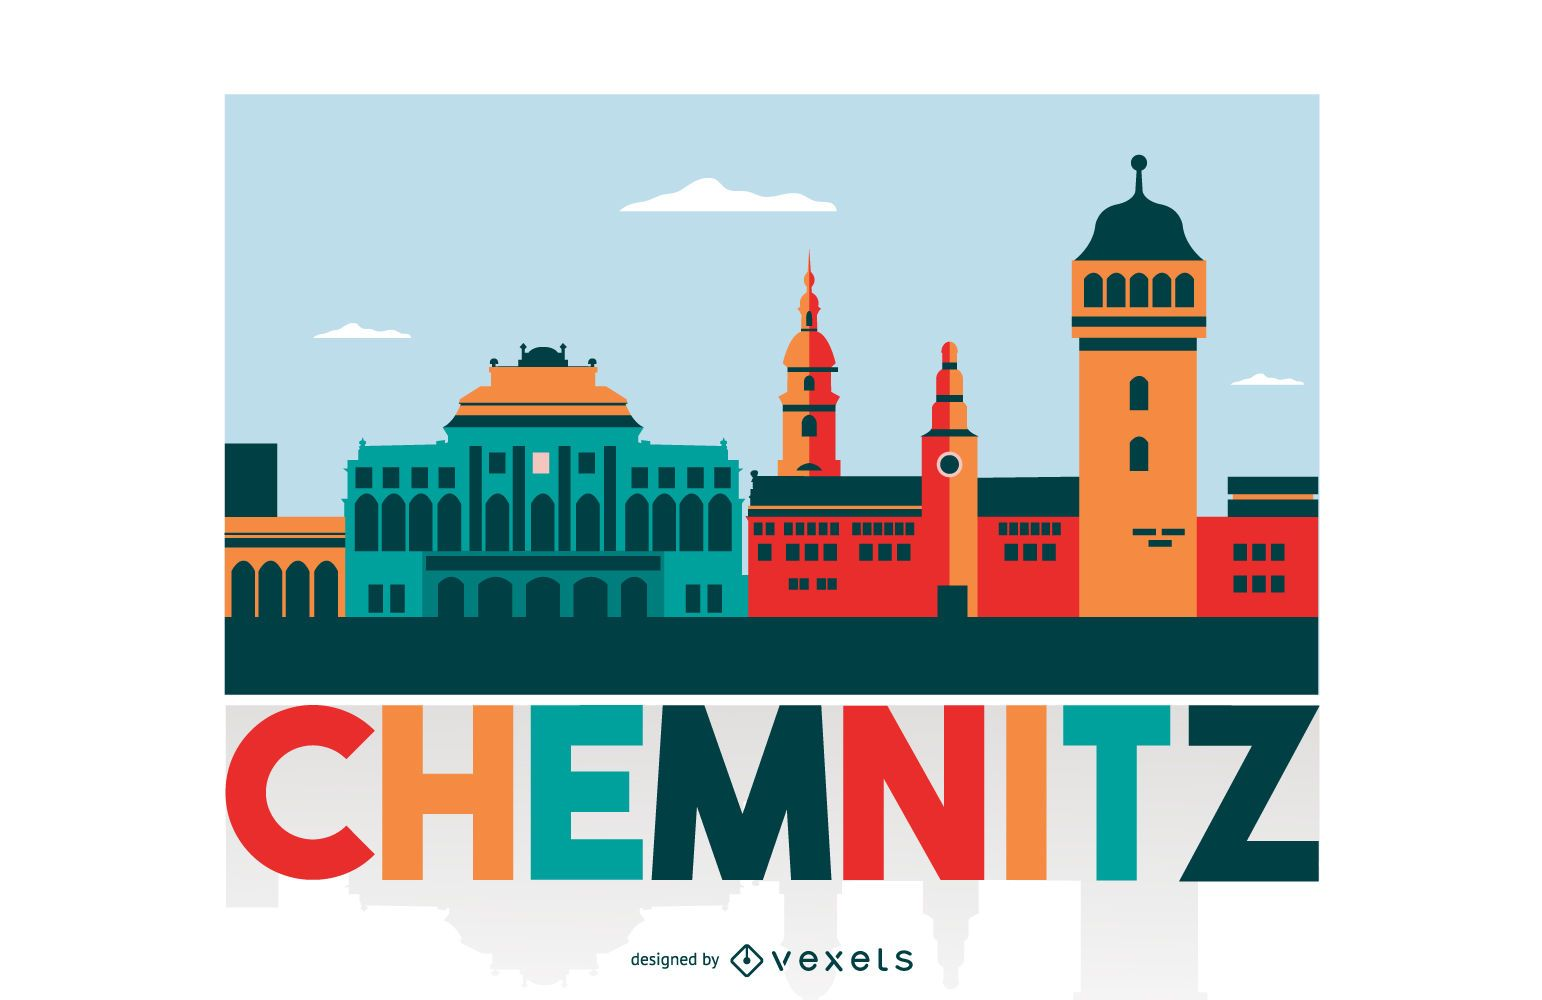 Chemnitz Colored City Skyline Design